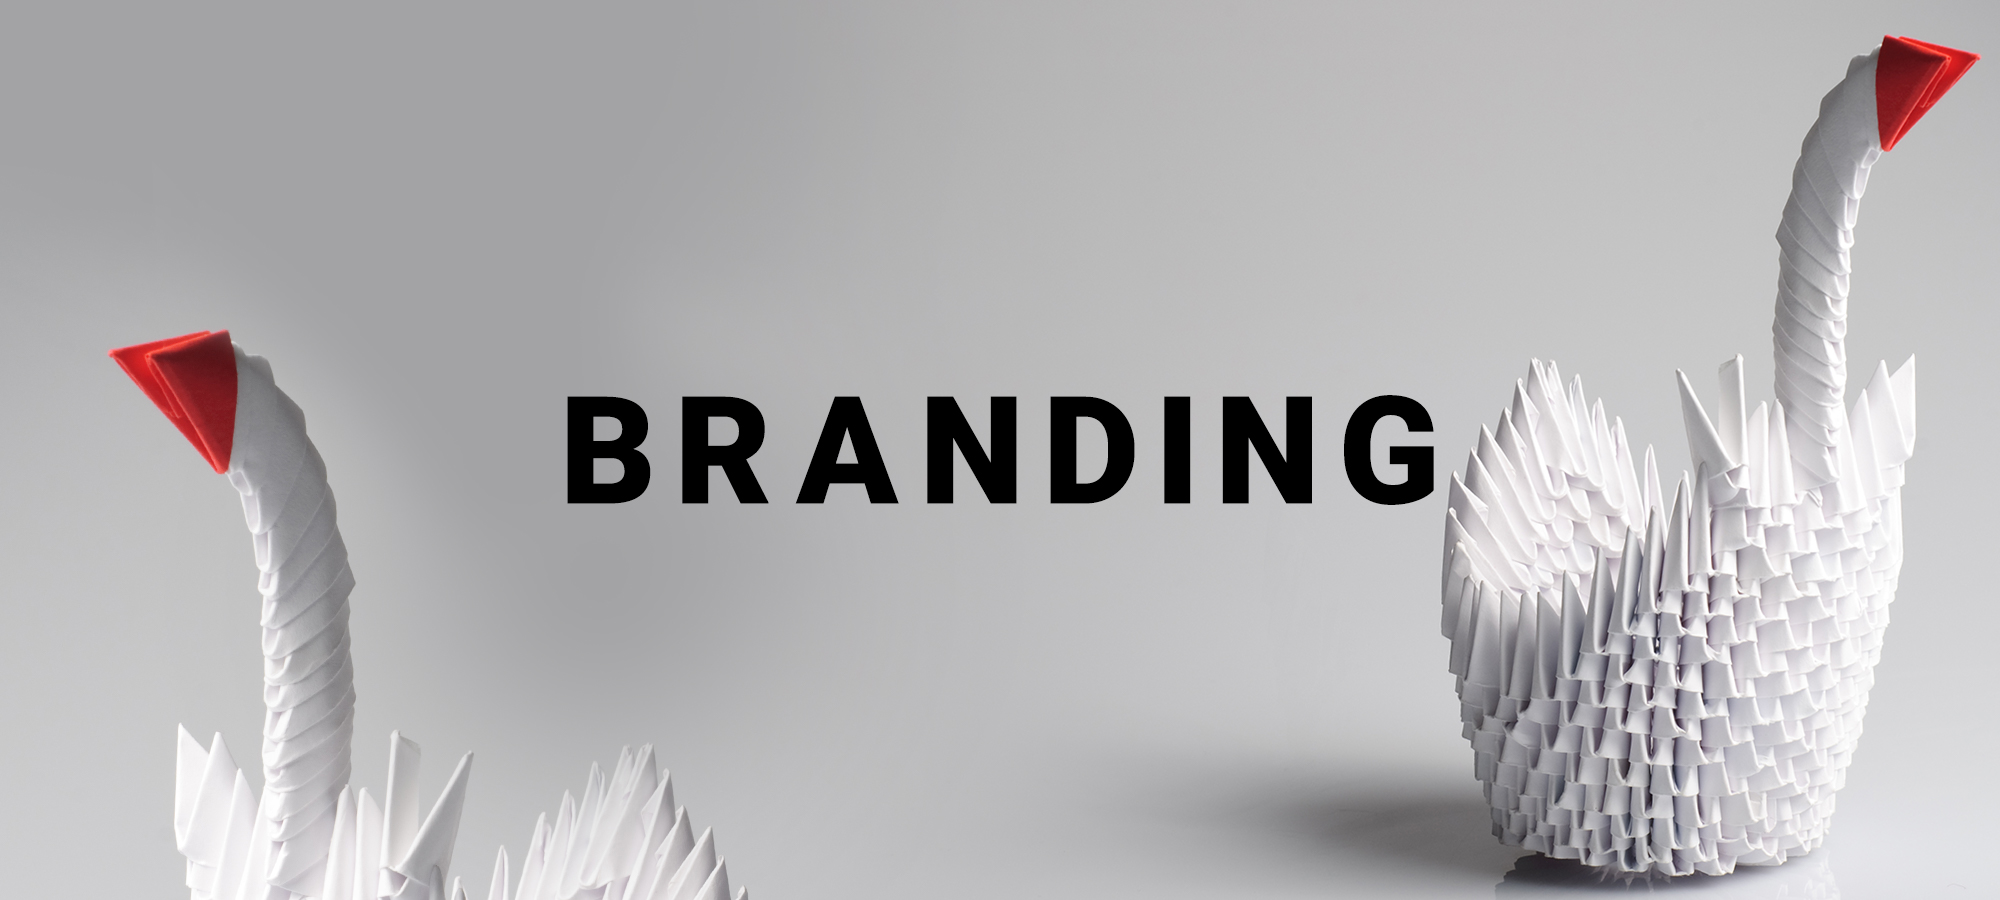 Branding step creativo cigni